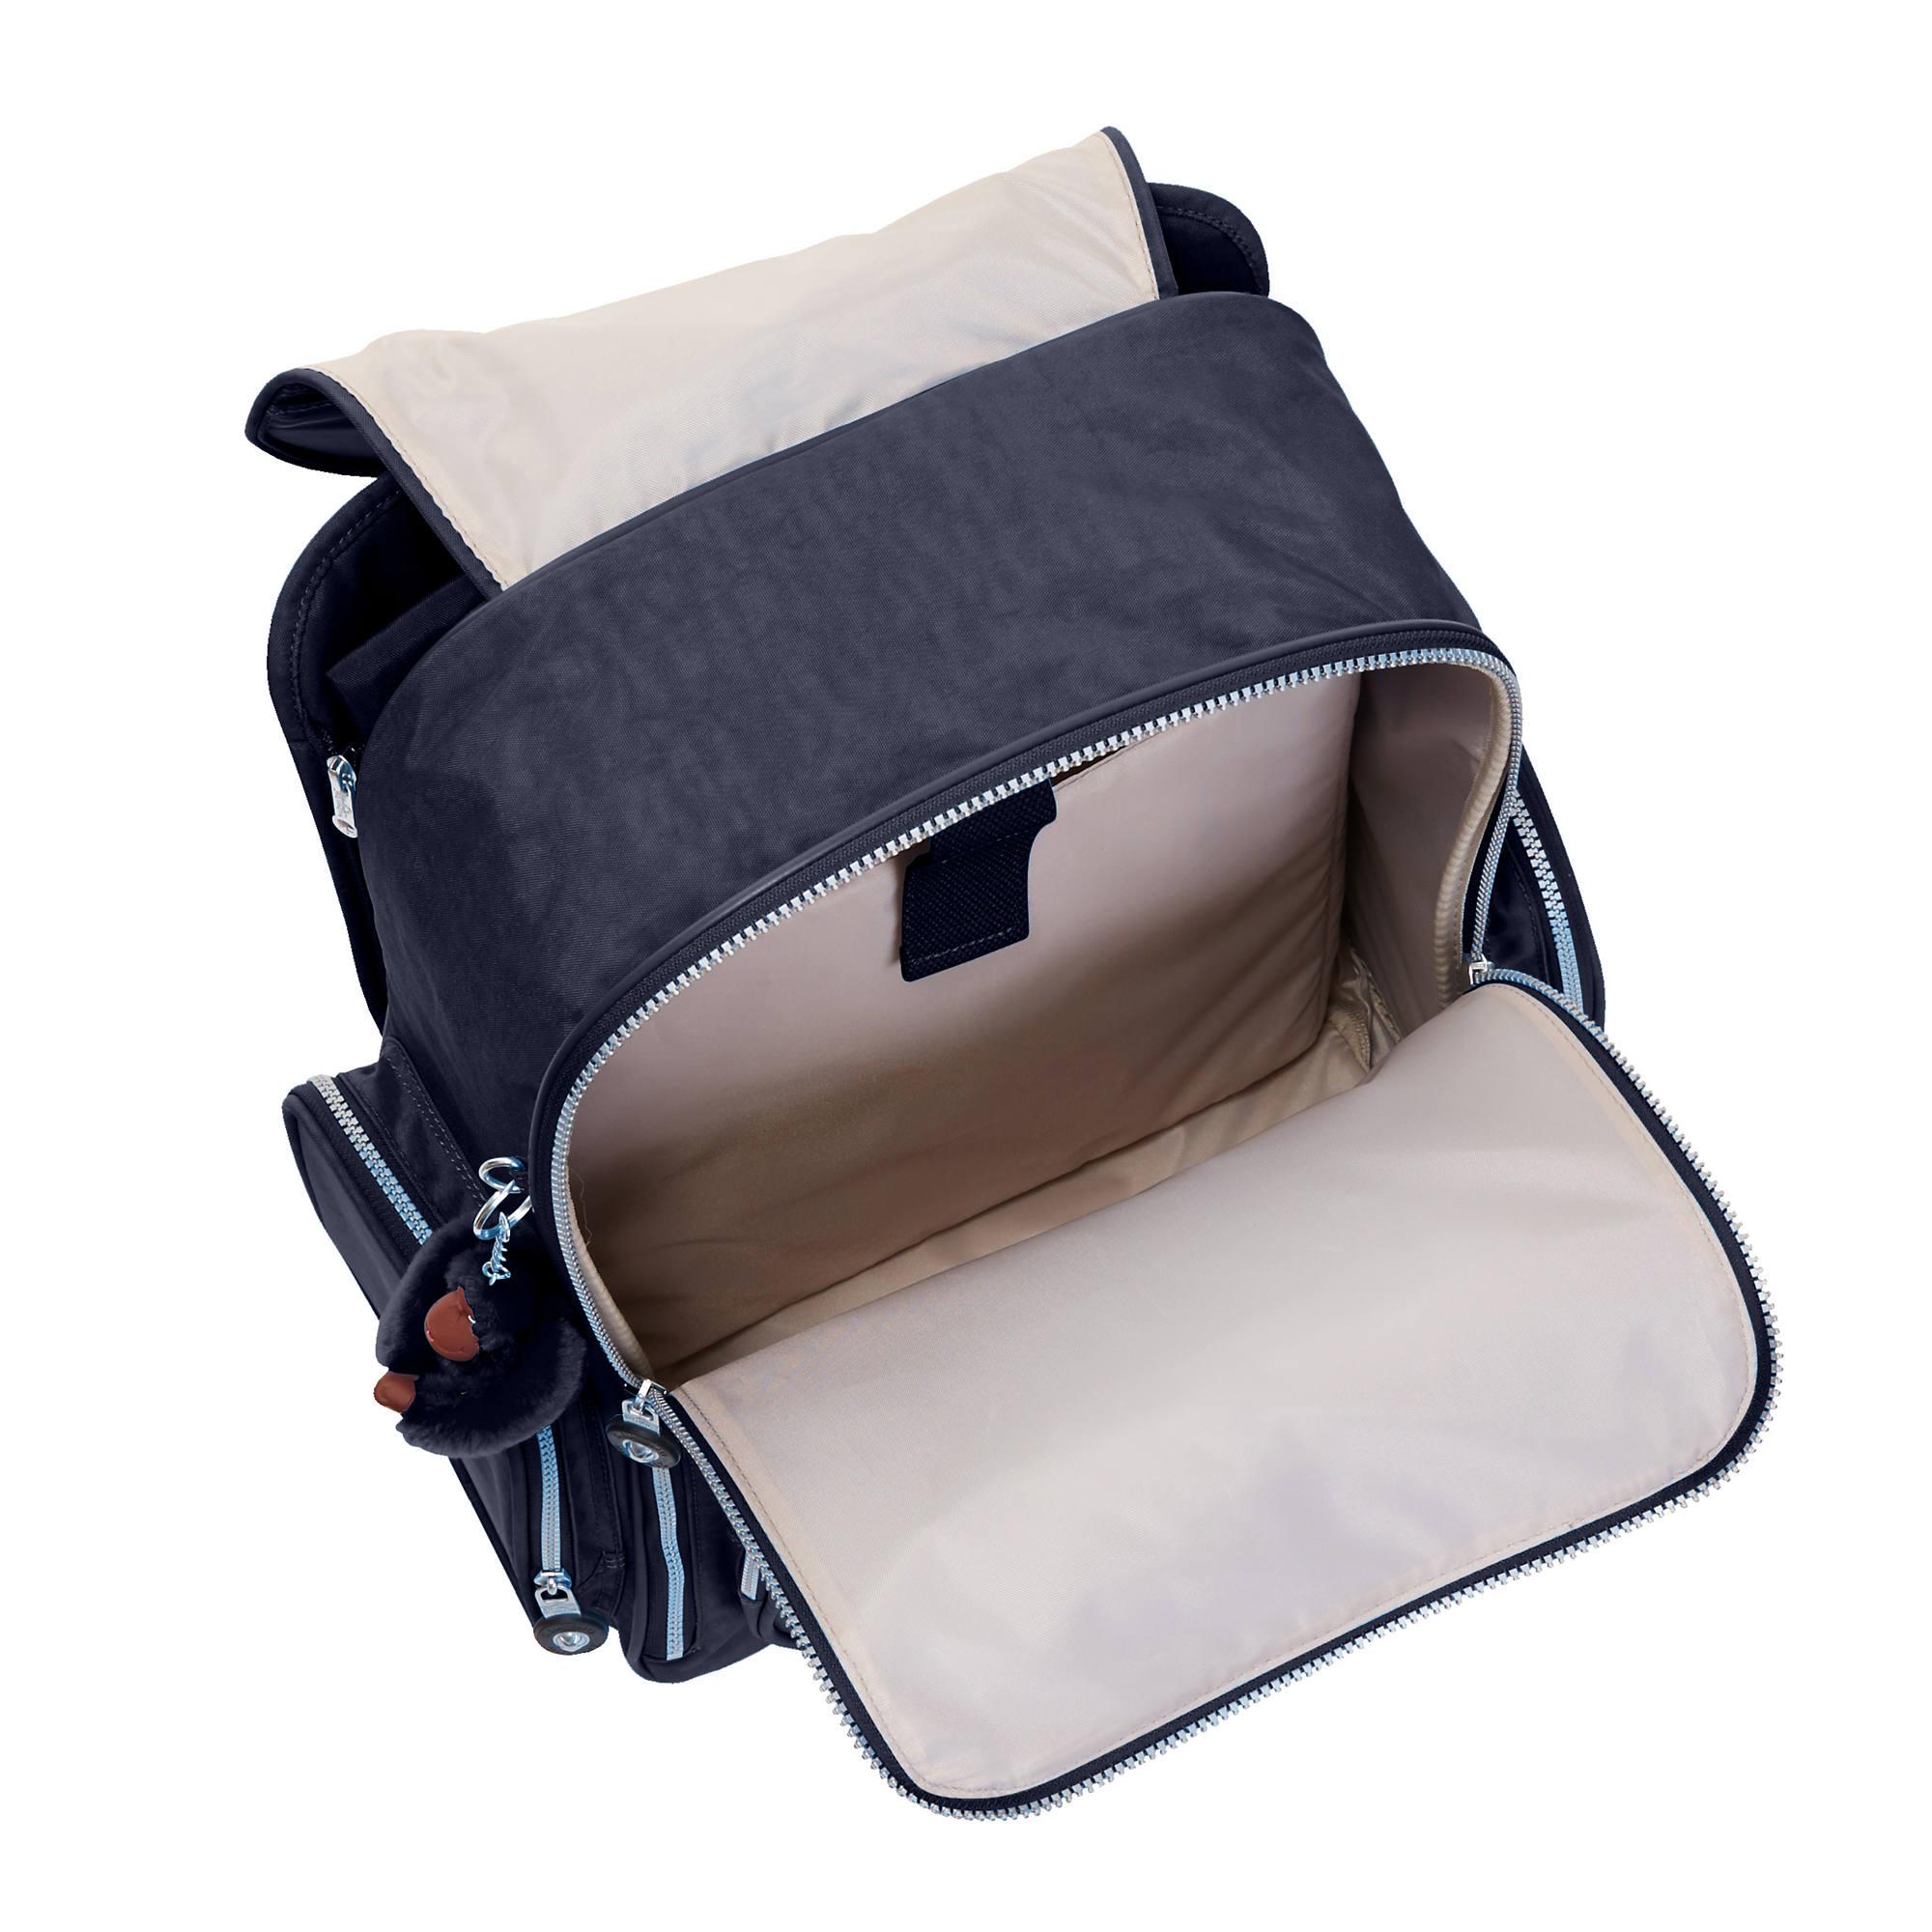 Kipling Alcatraz Ii Printed Rolling Laptop Backpack Ebay